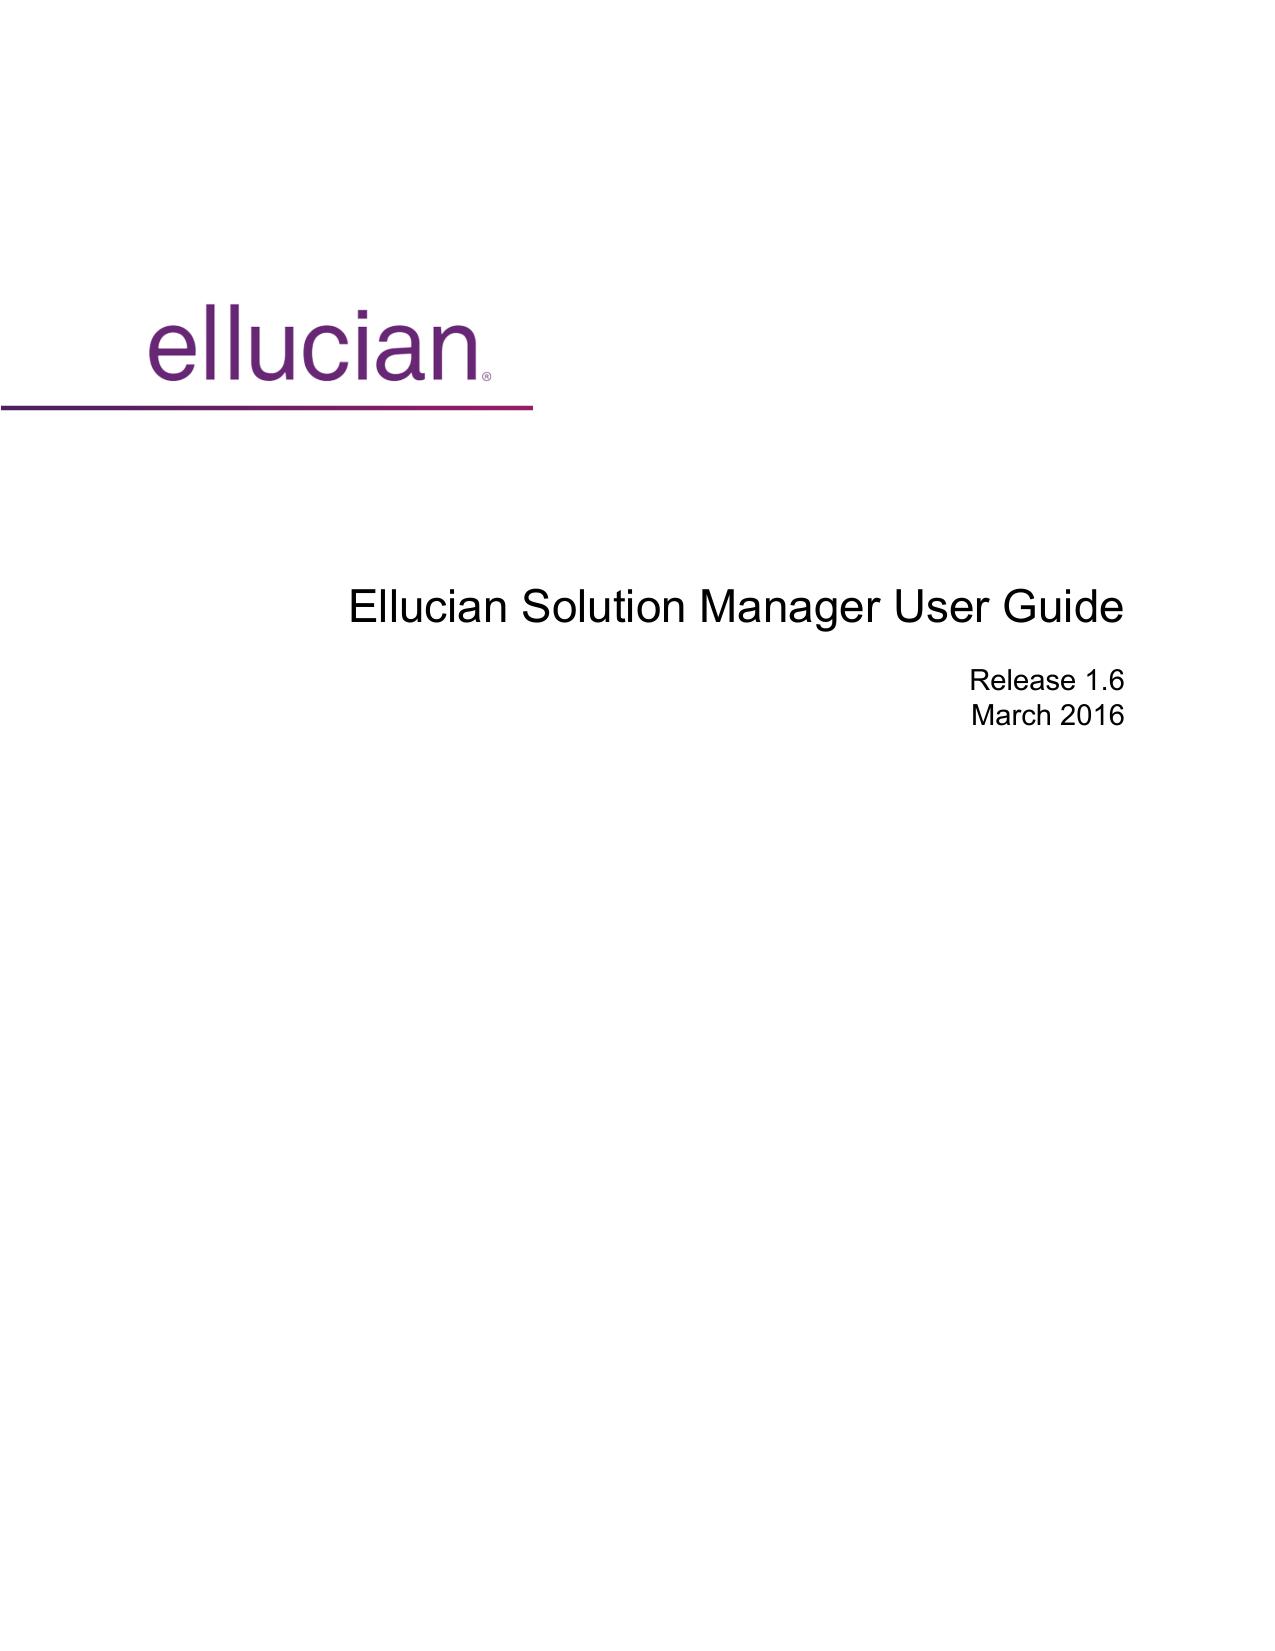 Ellucian Solution Manager User Guide | manualzz com